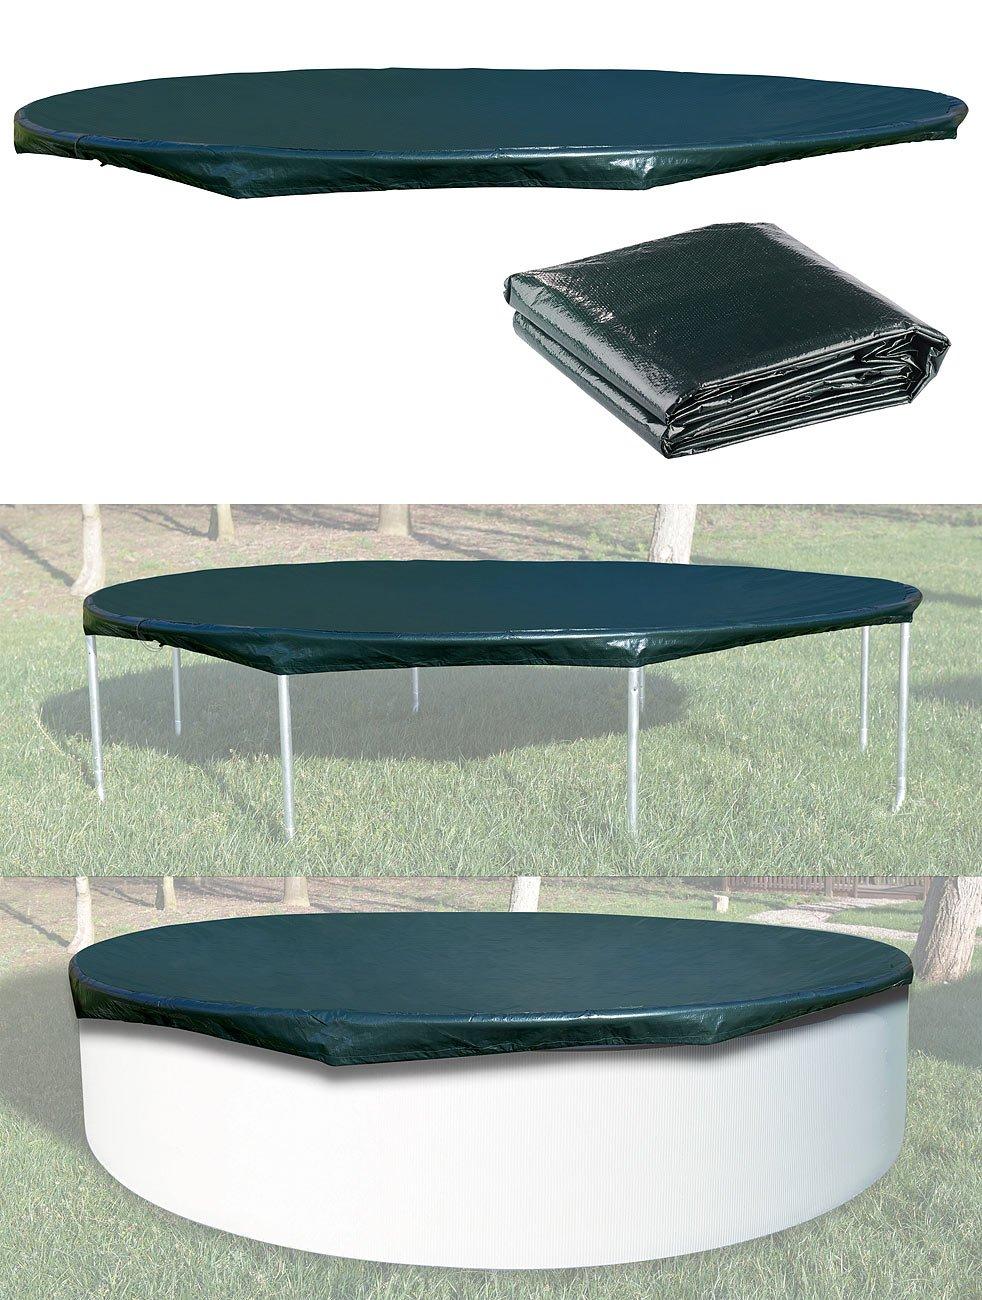 Bâche ronde pour piscine ou trampoline - Ø 3 m Royal gardineer